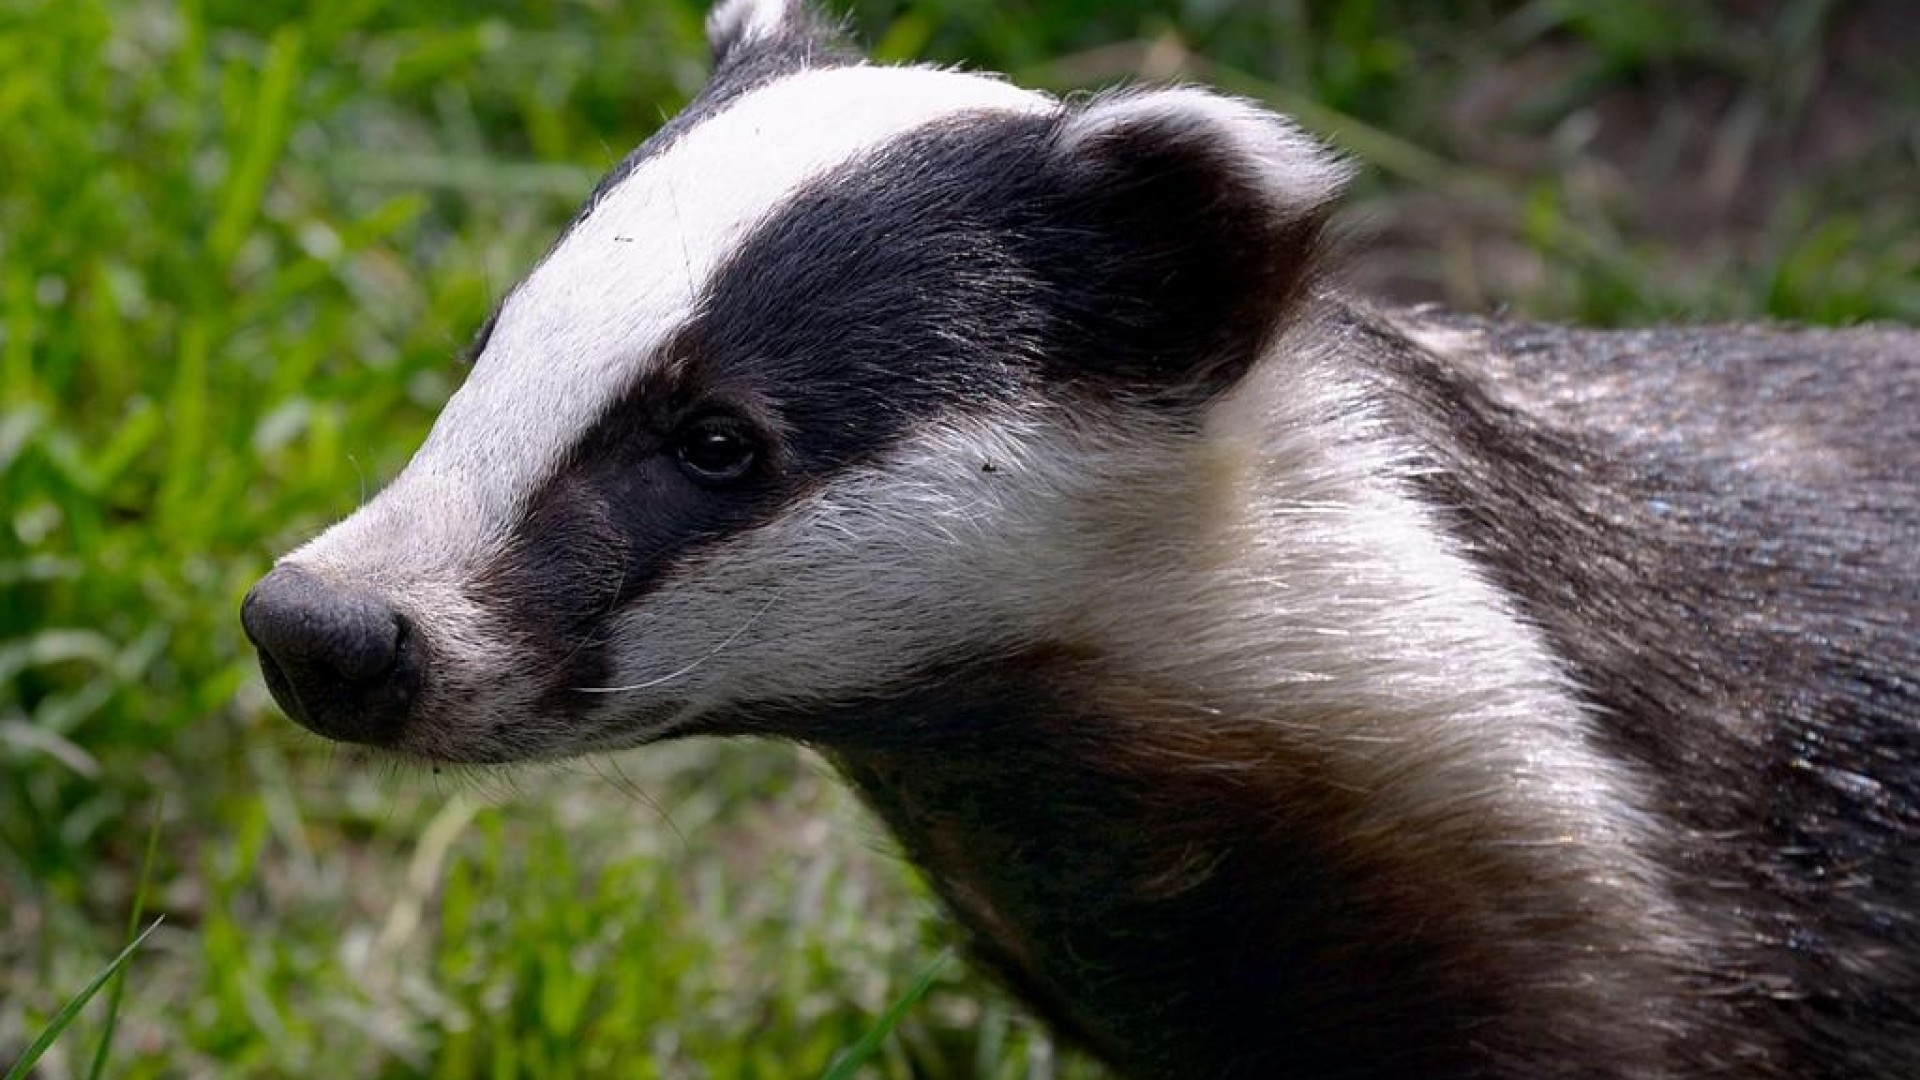 badger 1080p hd